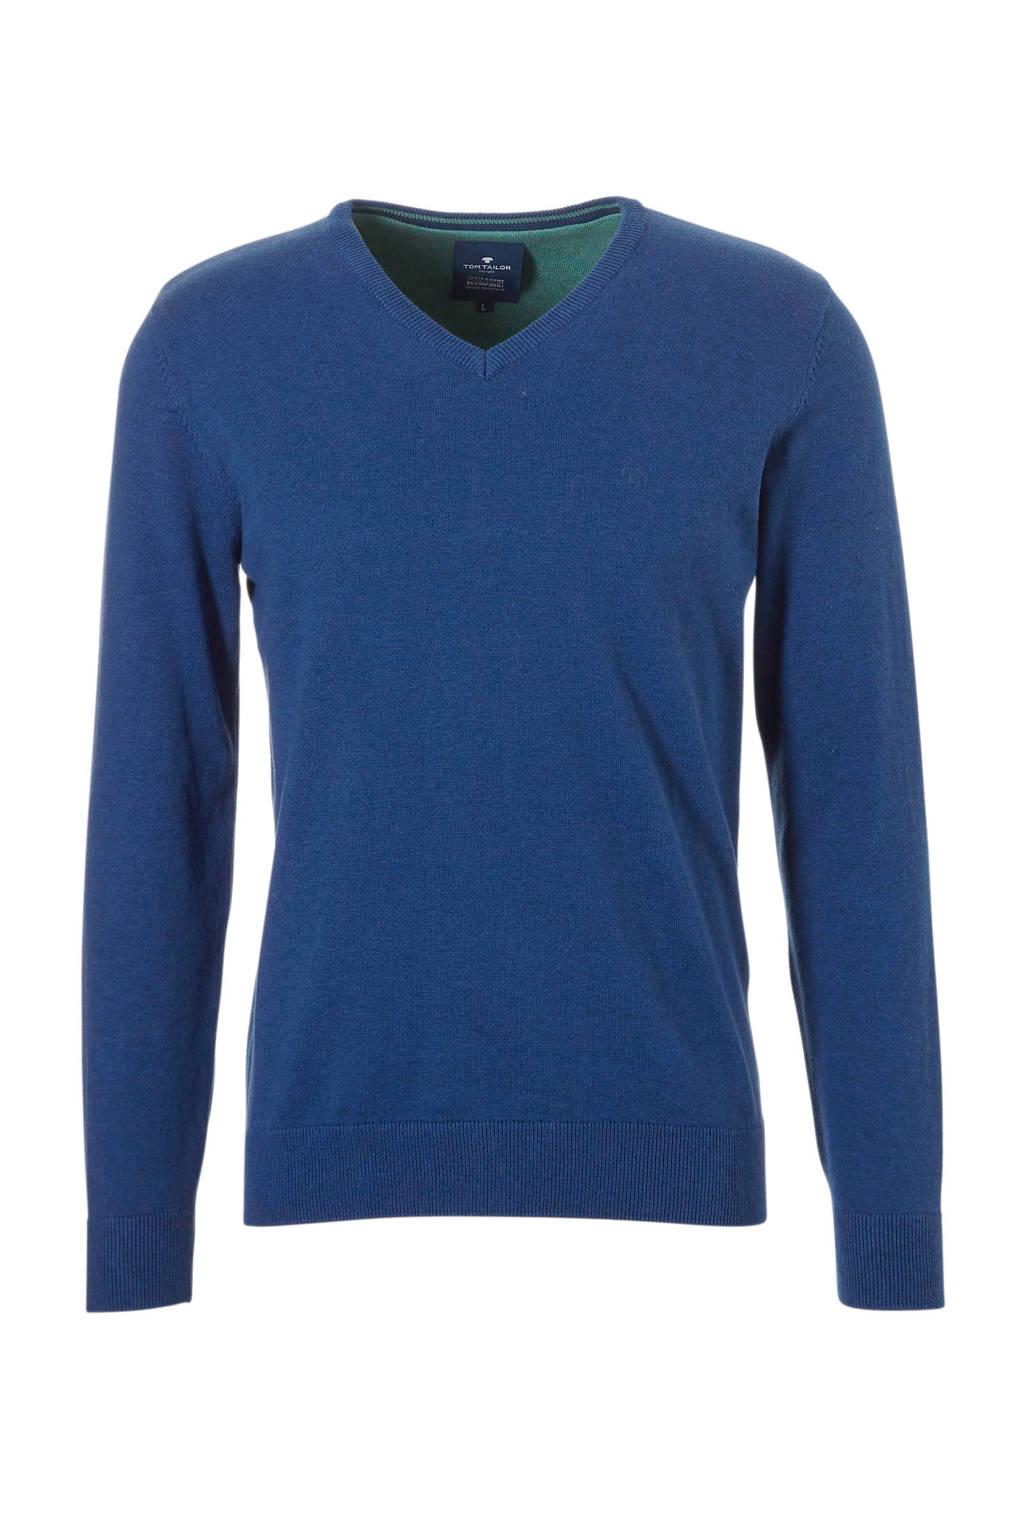 Tom Tailor Denim trui, Donkerblauw